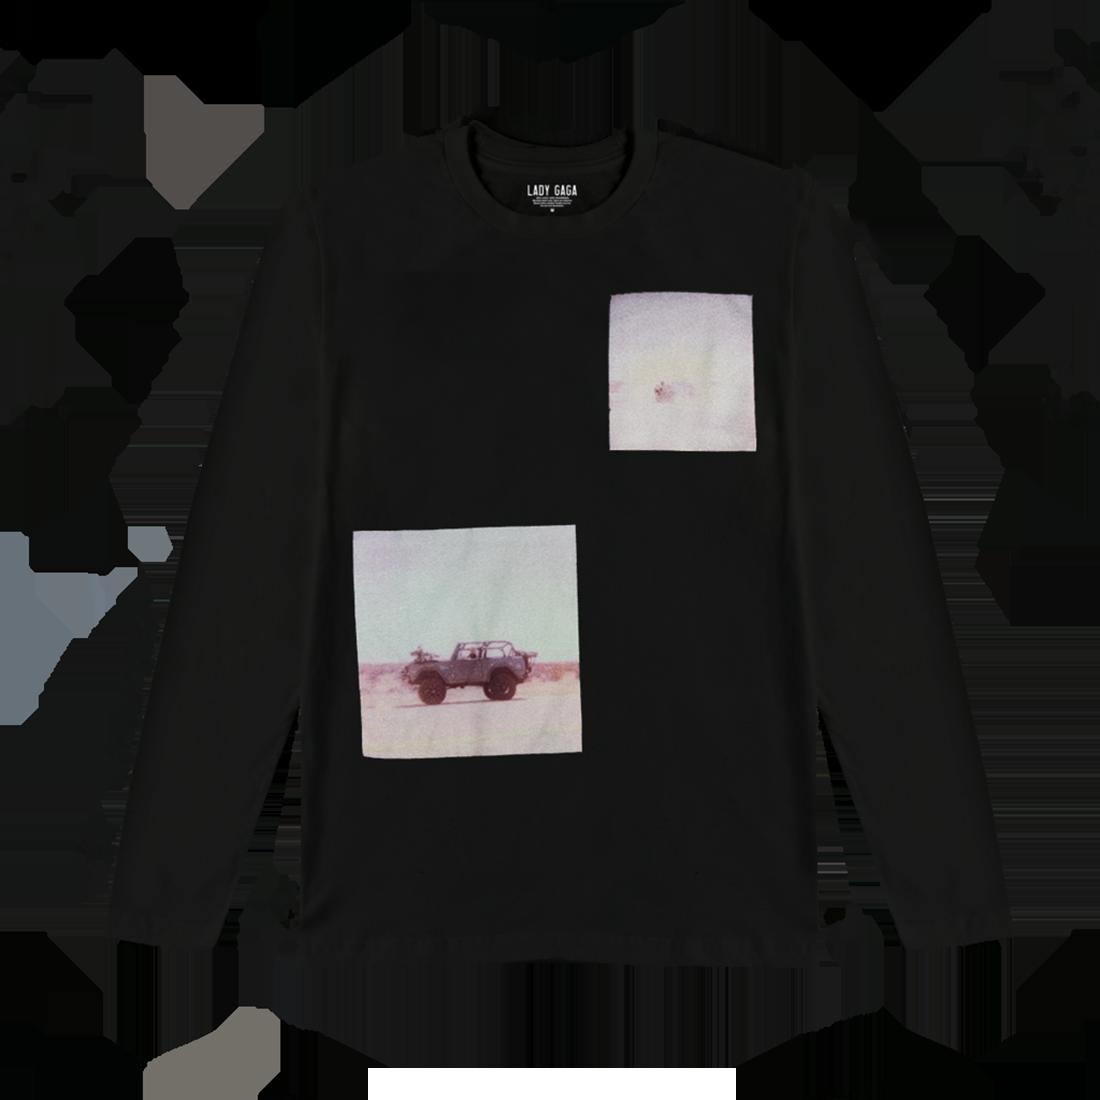 7249dfc3535 Lady Gaga: Polaroid Black Long Sleeve